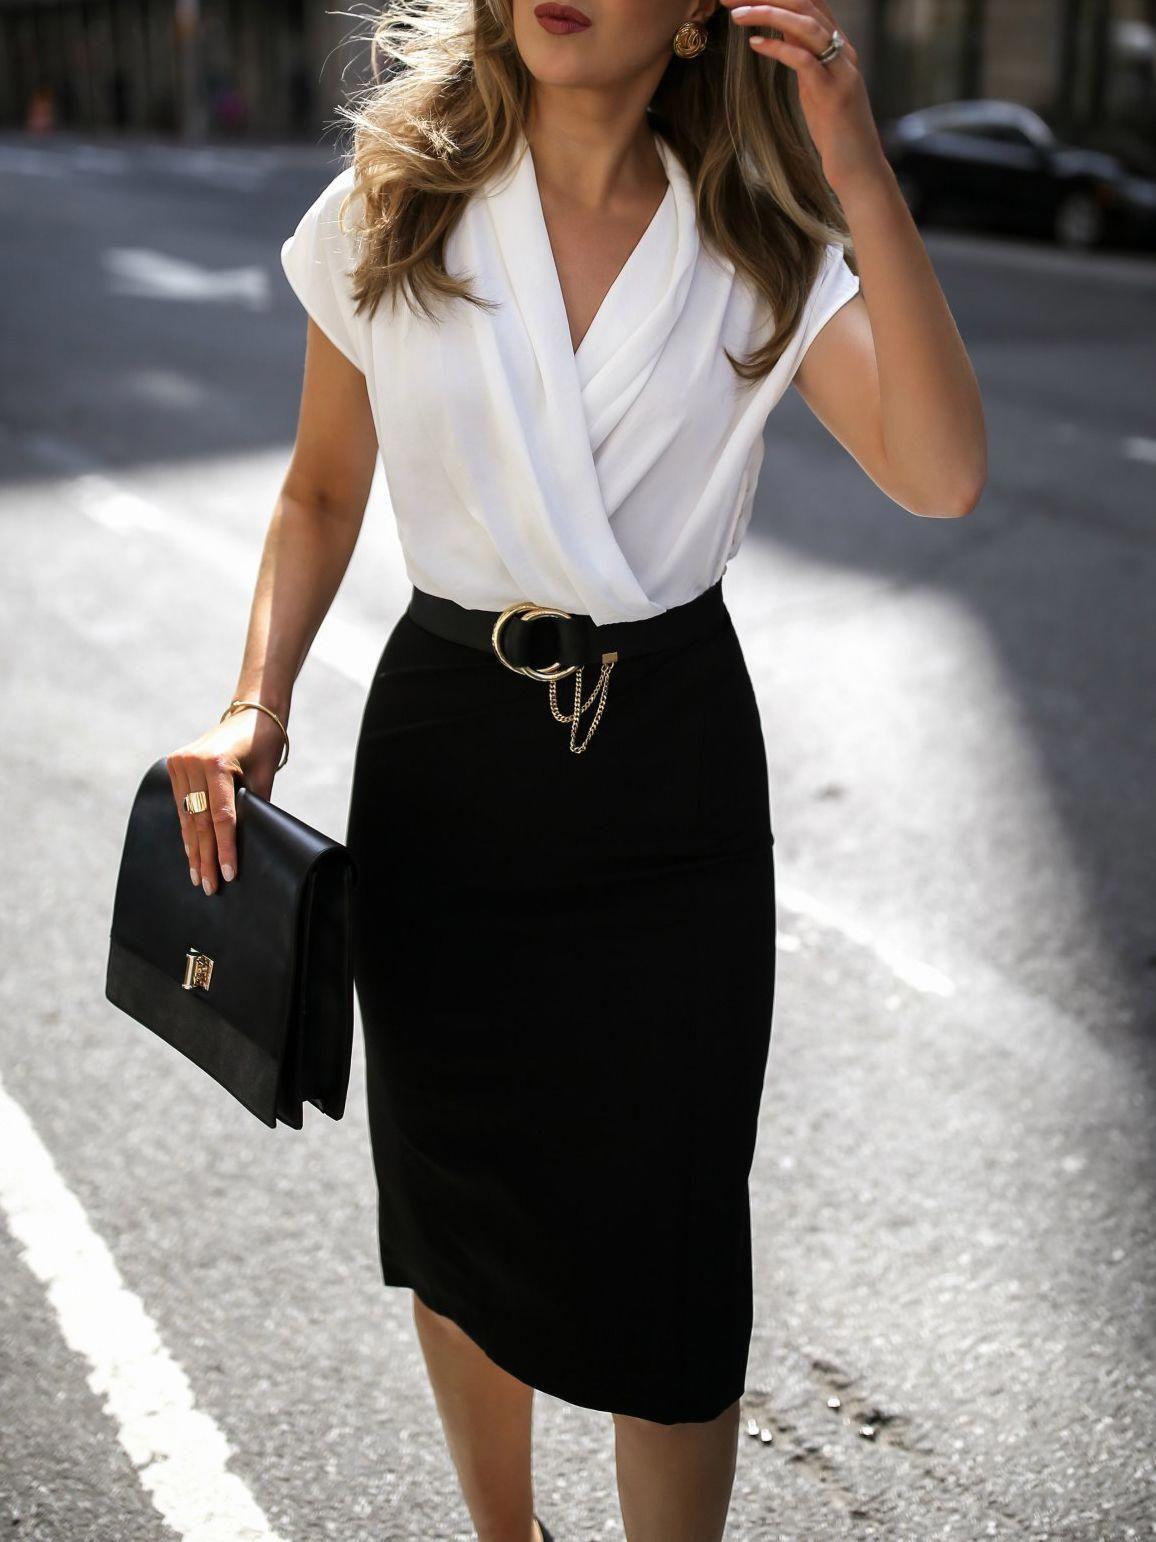 casual business attire #BUSINESSATTIRE #businessattiresummer casual business attire #BUSINESSATTIRE #womensbusinessattire